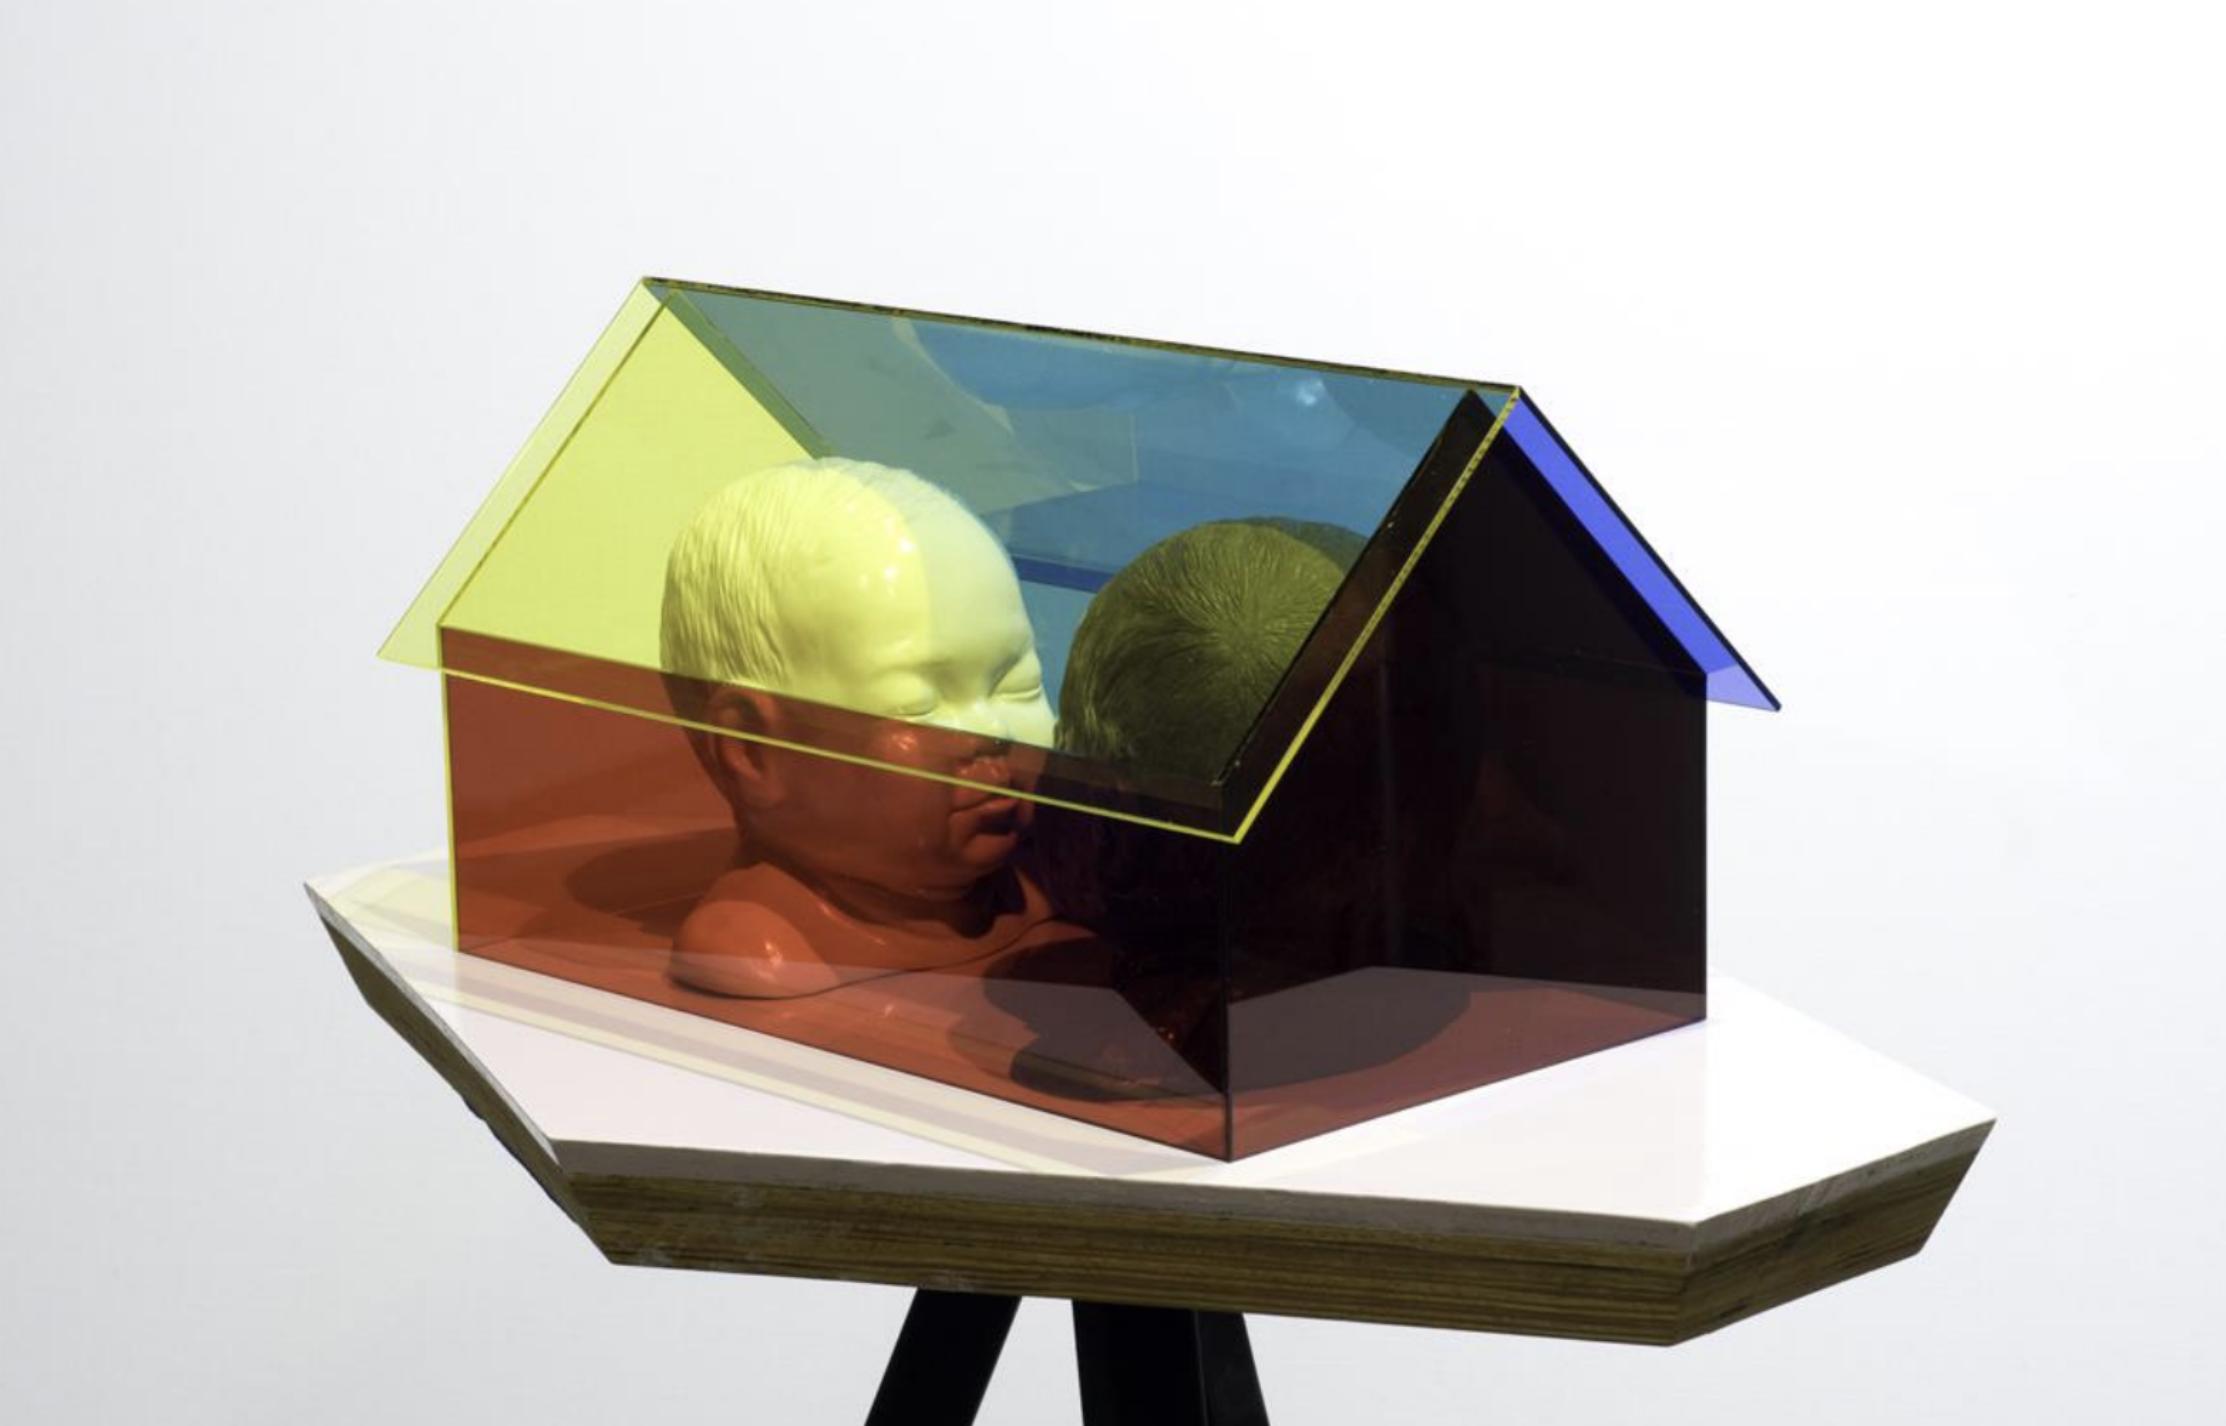 David Chan , Housed , 2017, Porcelain and Acrylic Box 36 x 21 x 21 cm. Courtesy of the artist & Art Seasons.